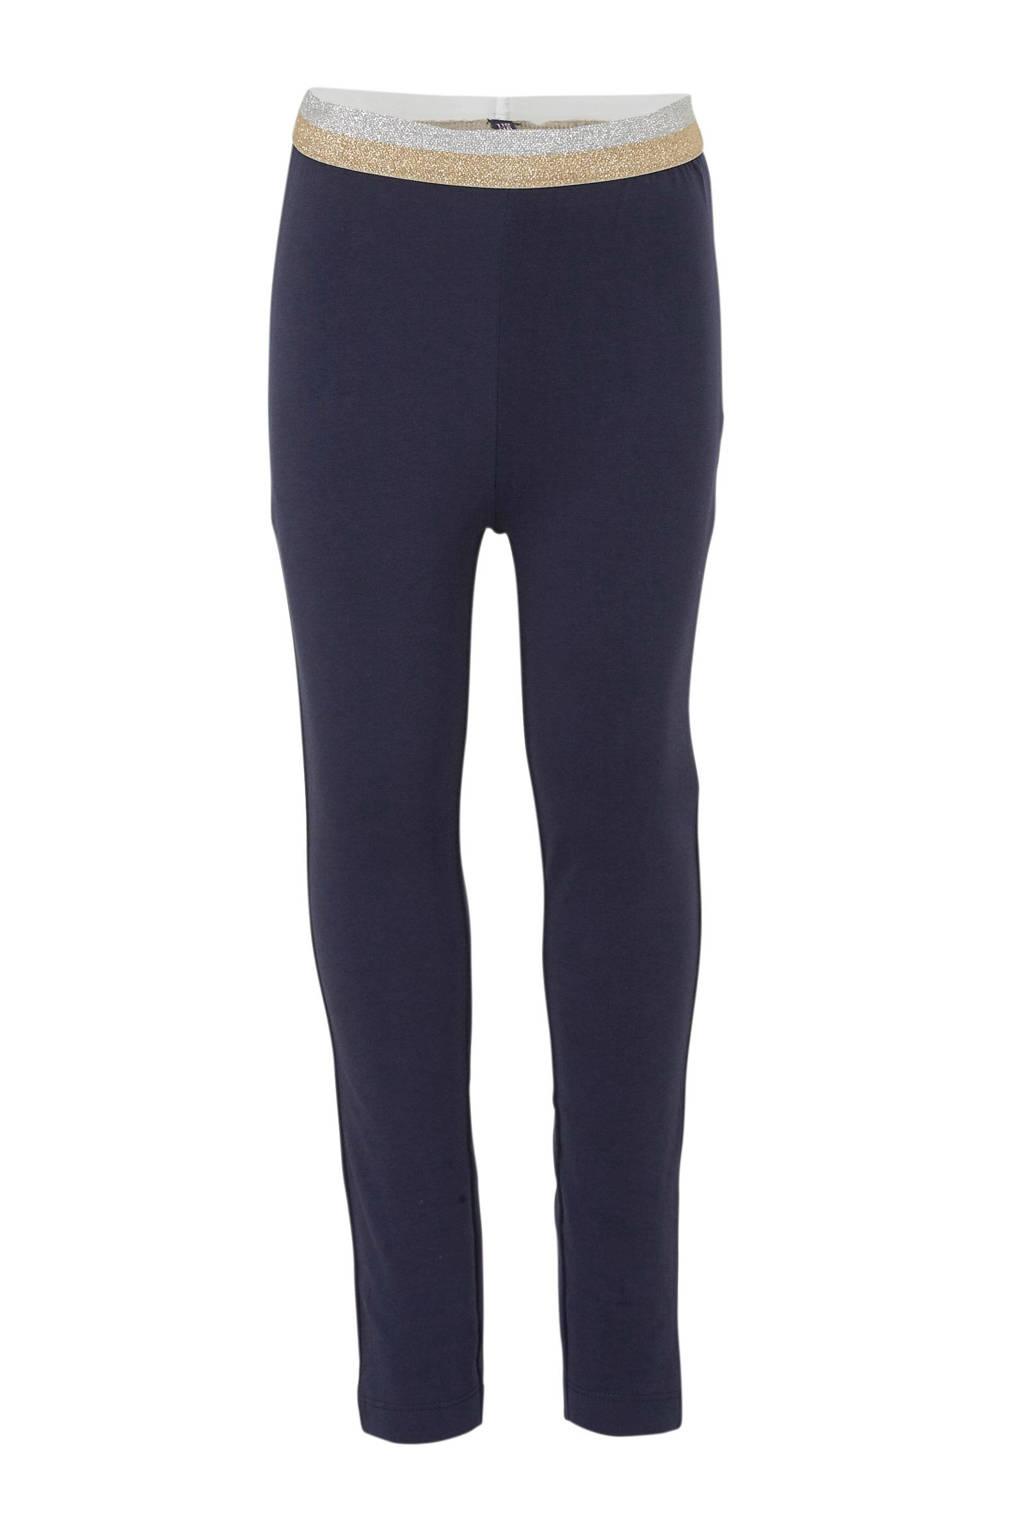 Quapi regular fit legging Annebel donkerblauw/zilver/goud, Donkerblauw/zilver/goud